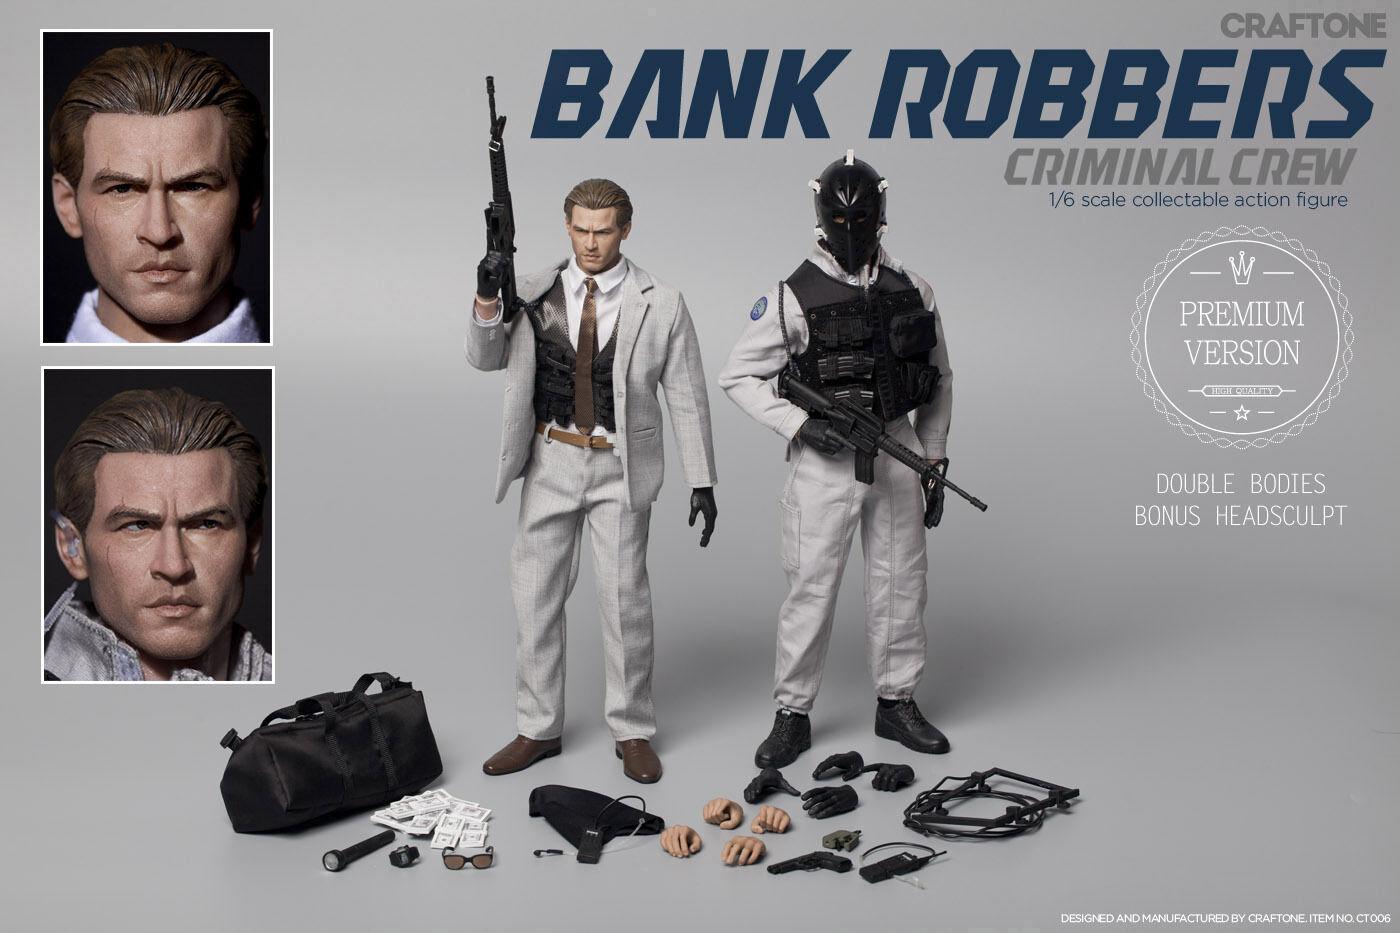 CRAFTONE Bank Robbers - Criminal Crew Val Kilmer Premium Ver 1/6 Figure